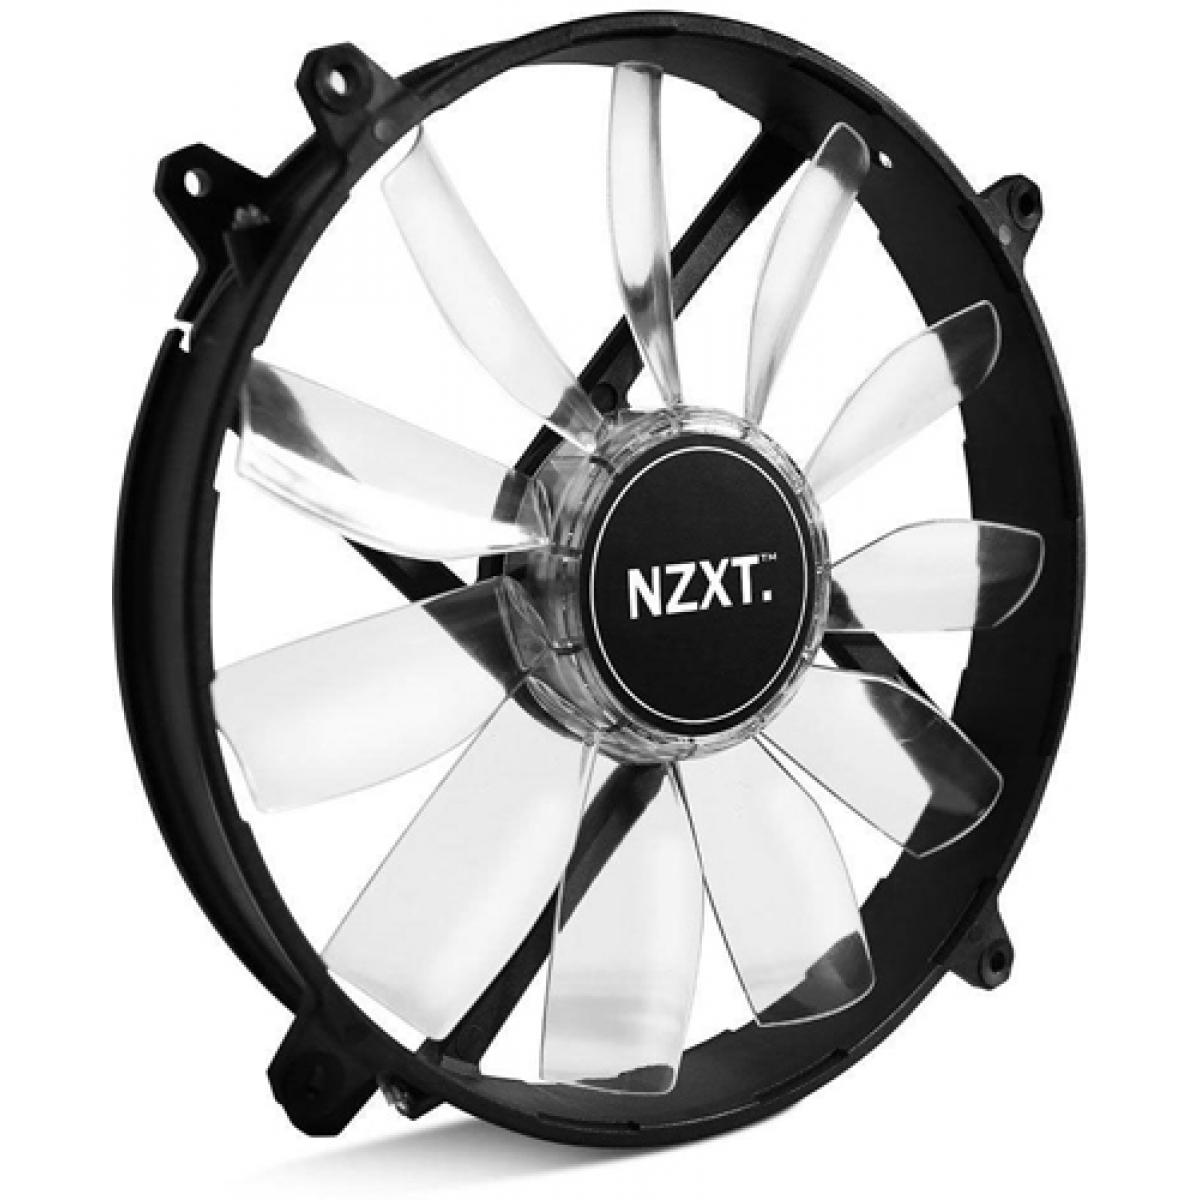 Cooler para Gabinete NZXT FZ-200, LED Laranja 200X30mm, RF-FZ20S-O1